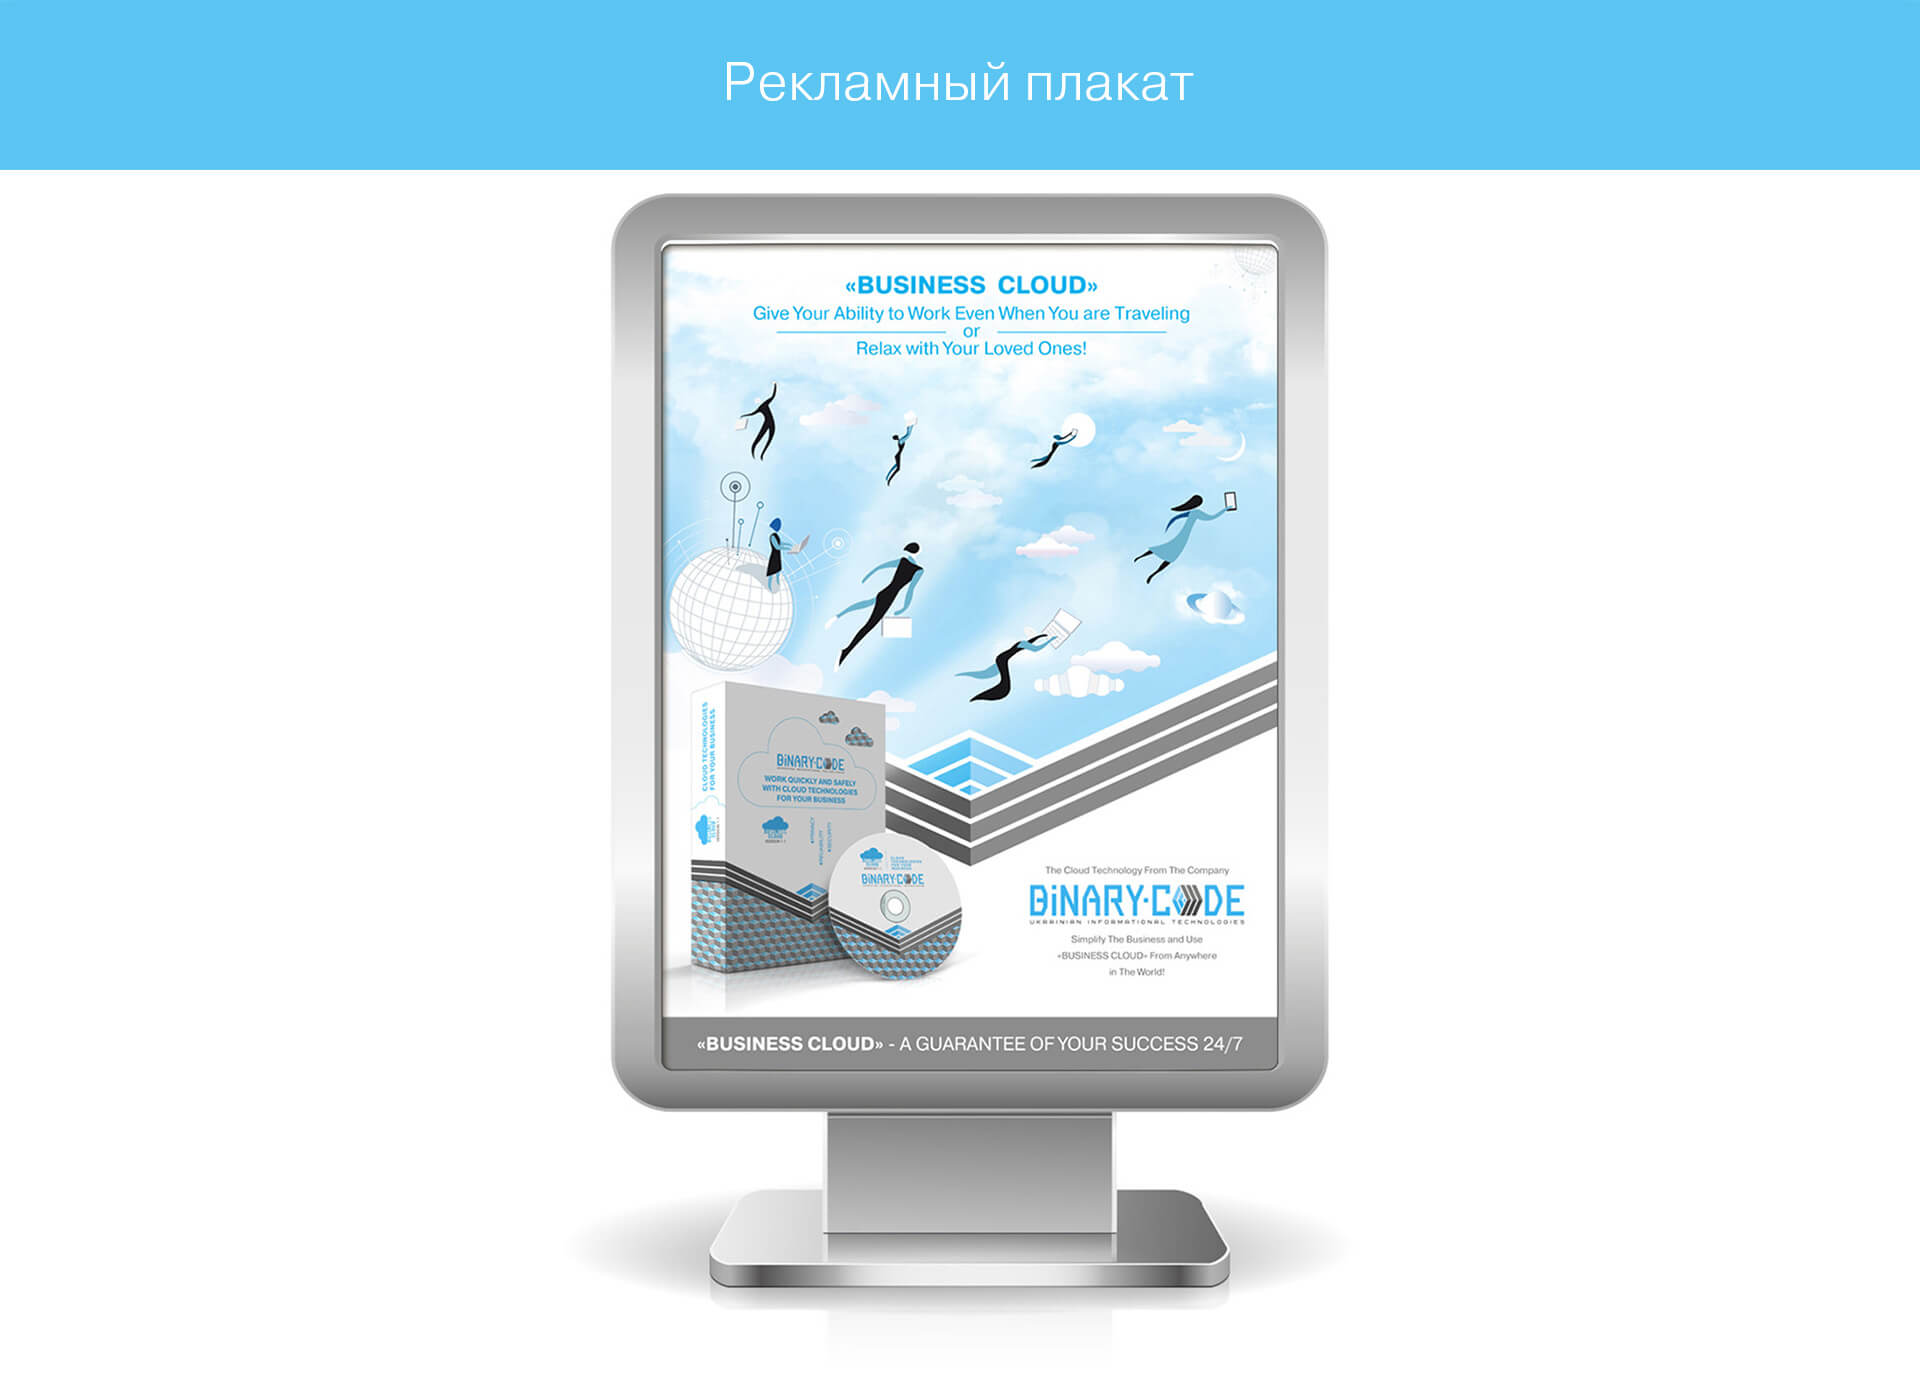 Разработка и создание рекламного плаката от Fantastic Imago брендиногове рекламное агентство